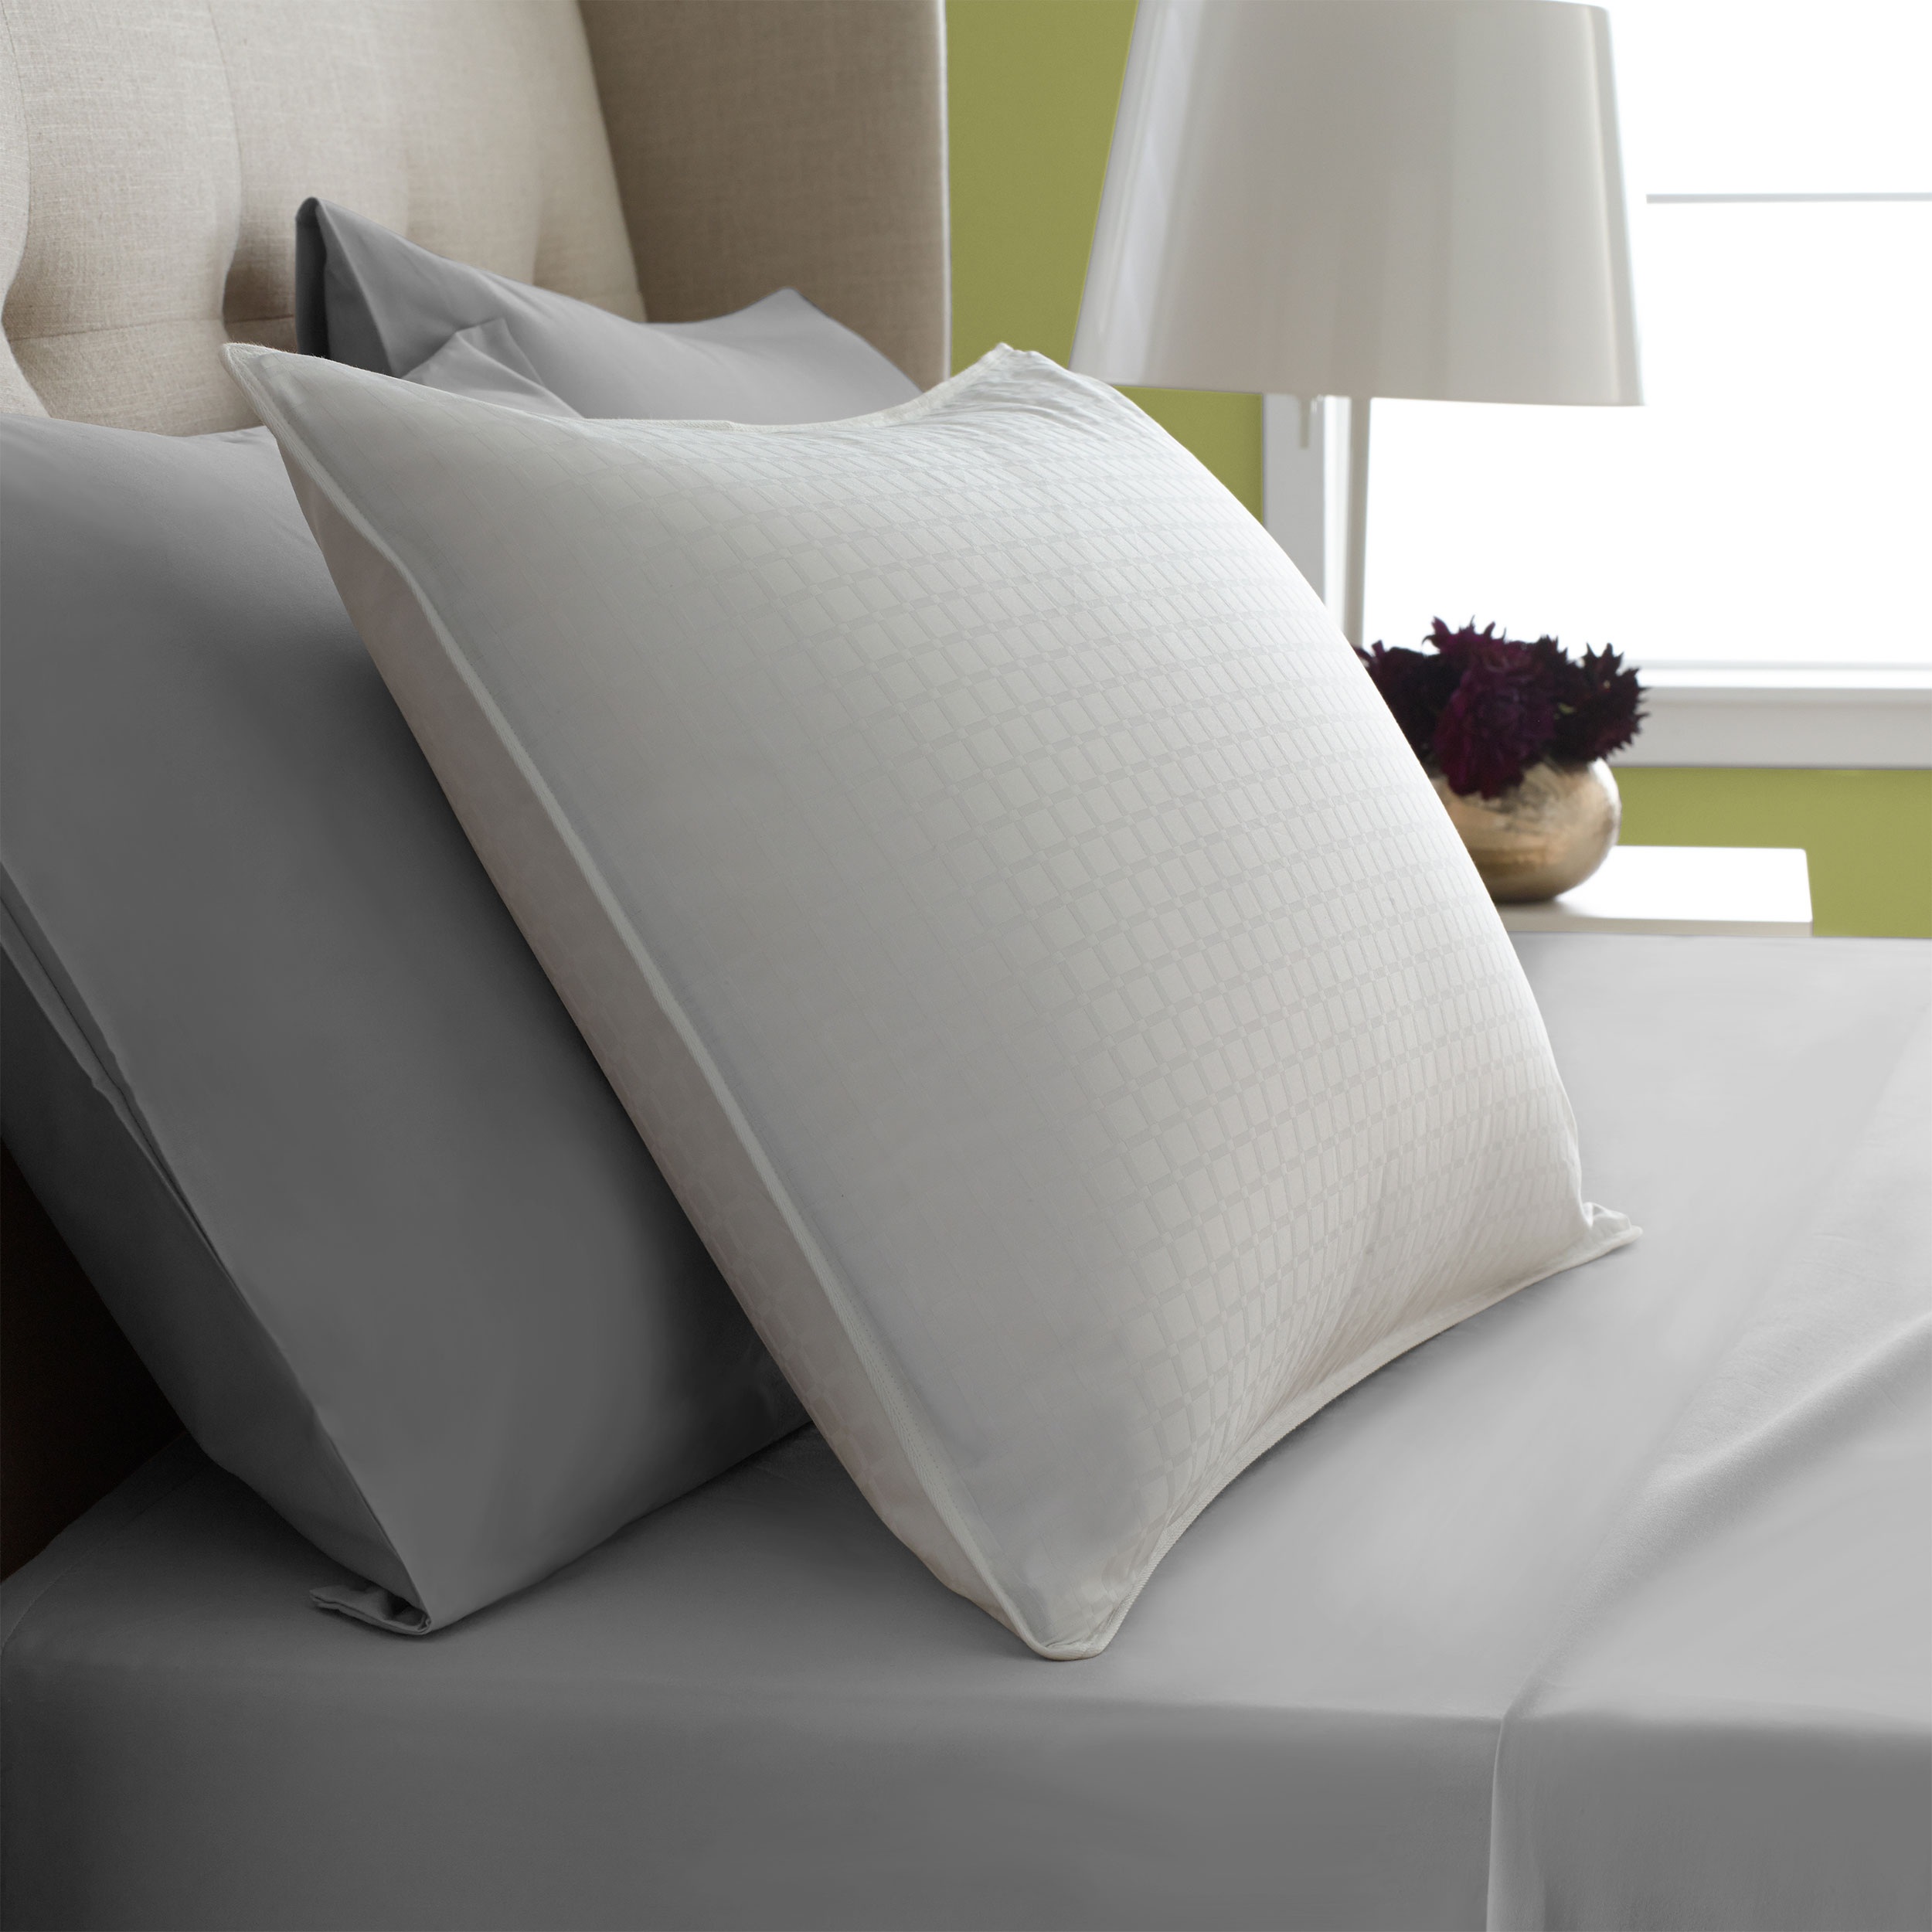 Pacific Coast® Online Bedding Stores Protectors